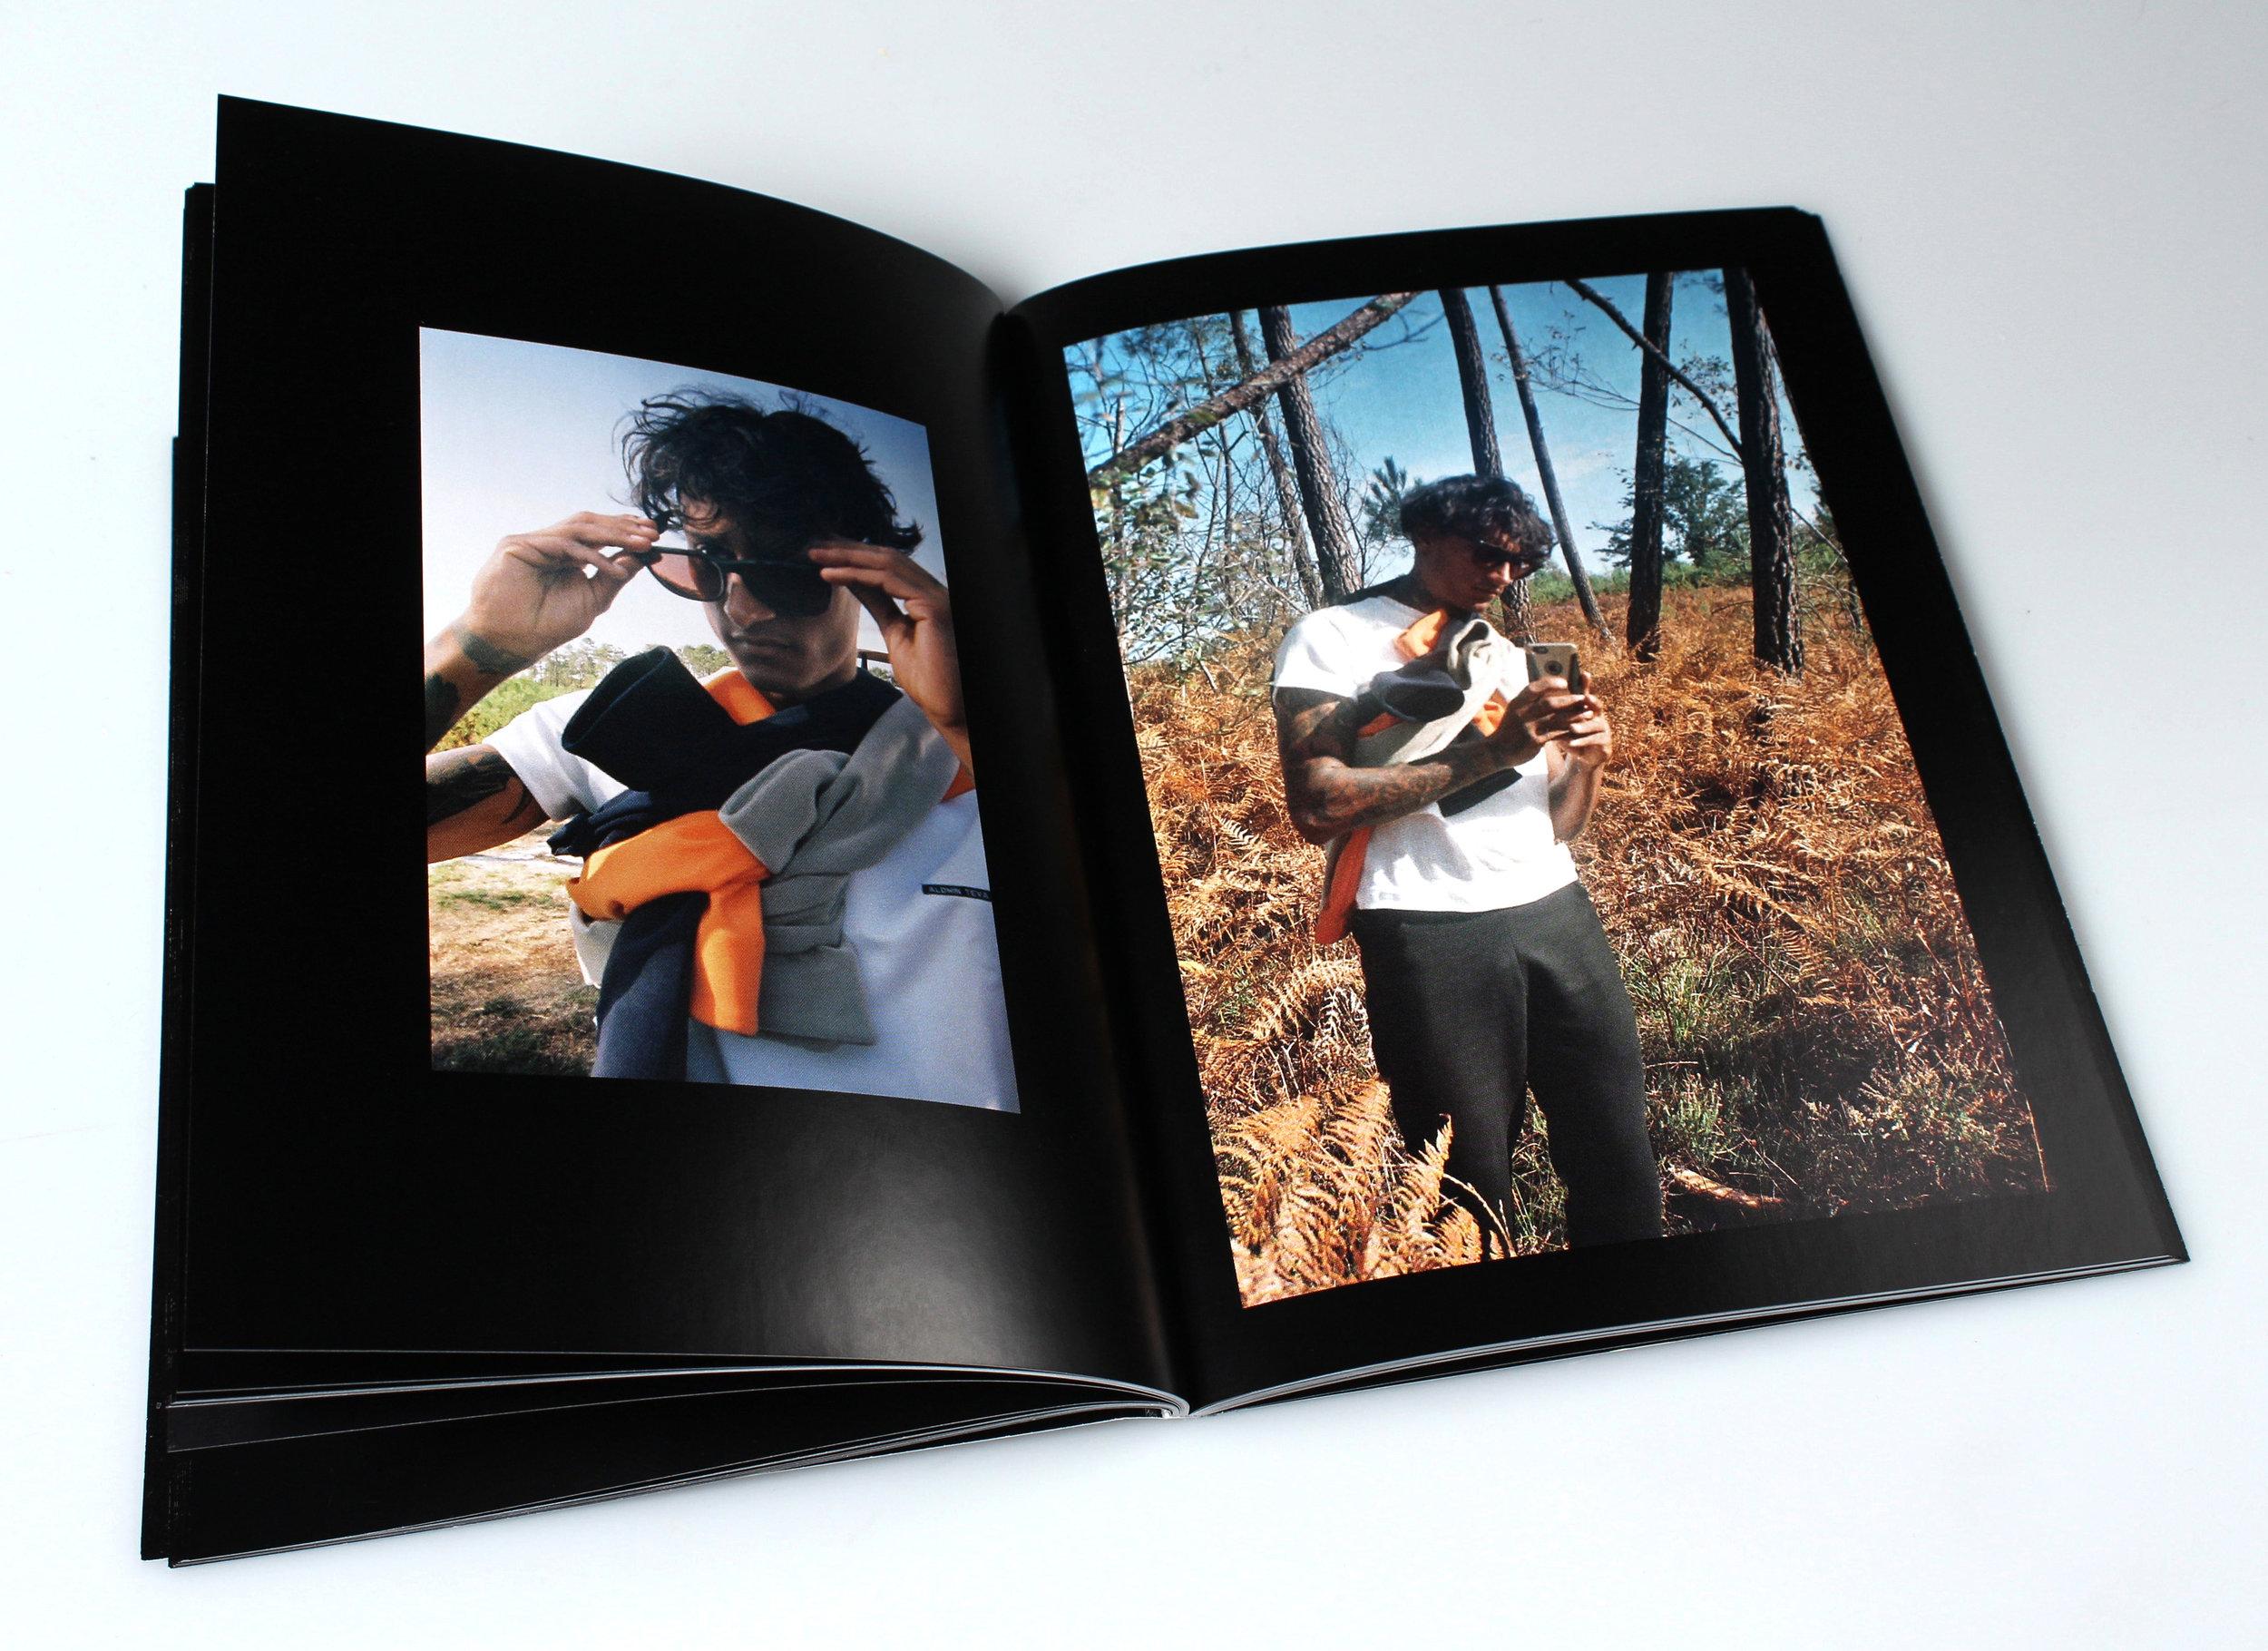 ewan-waddell-semi-zine-photography-submission-1.jpg